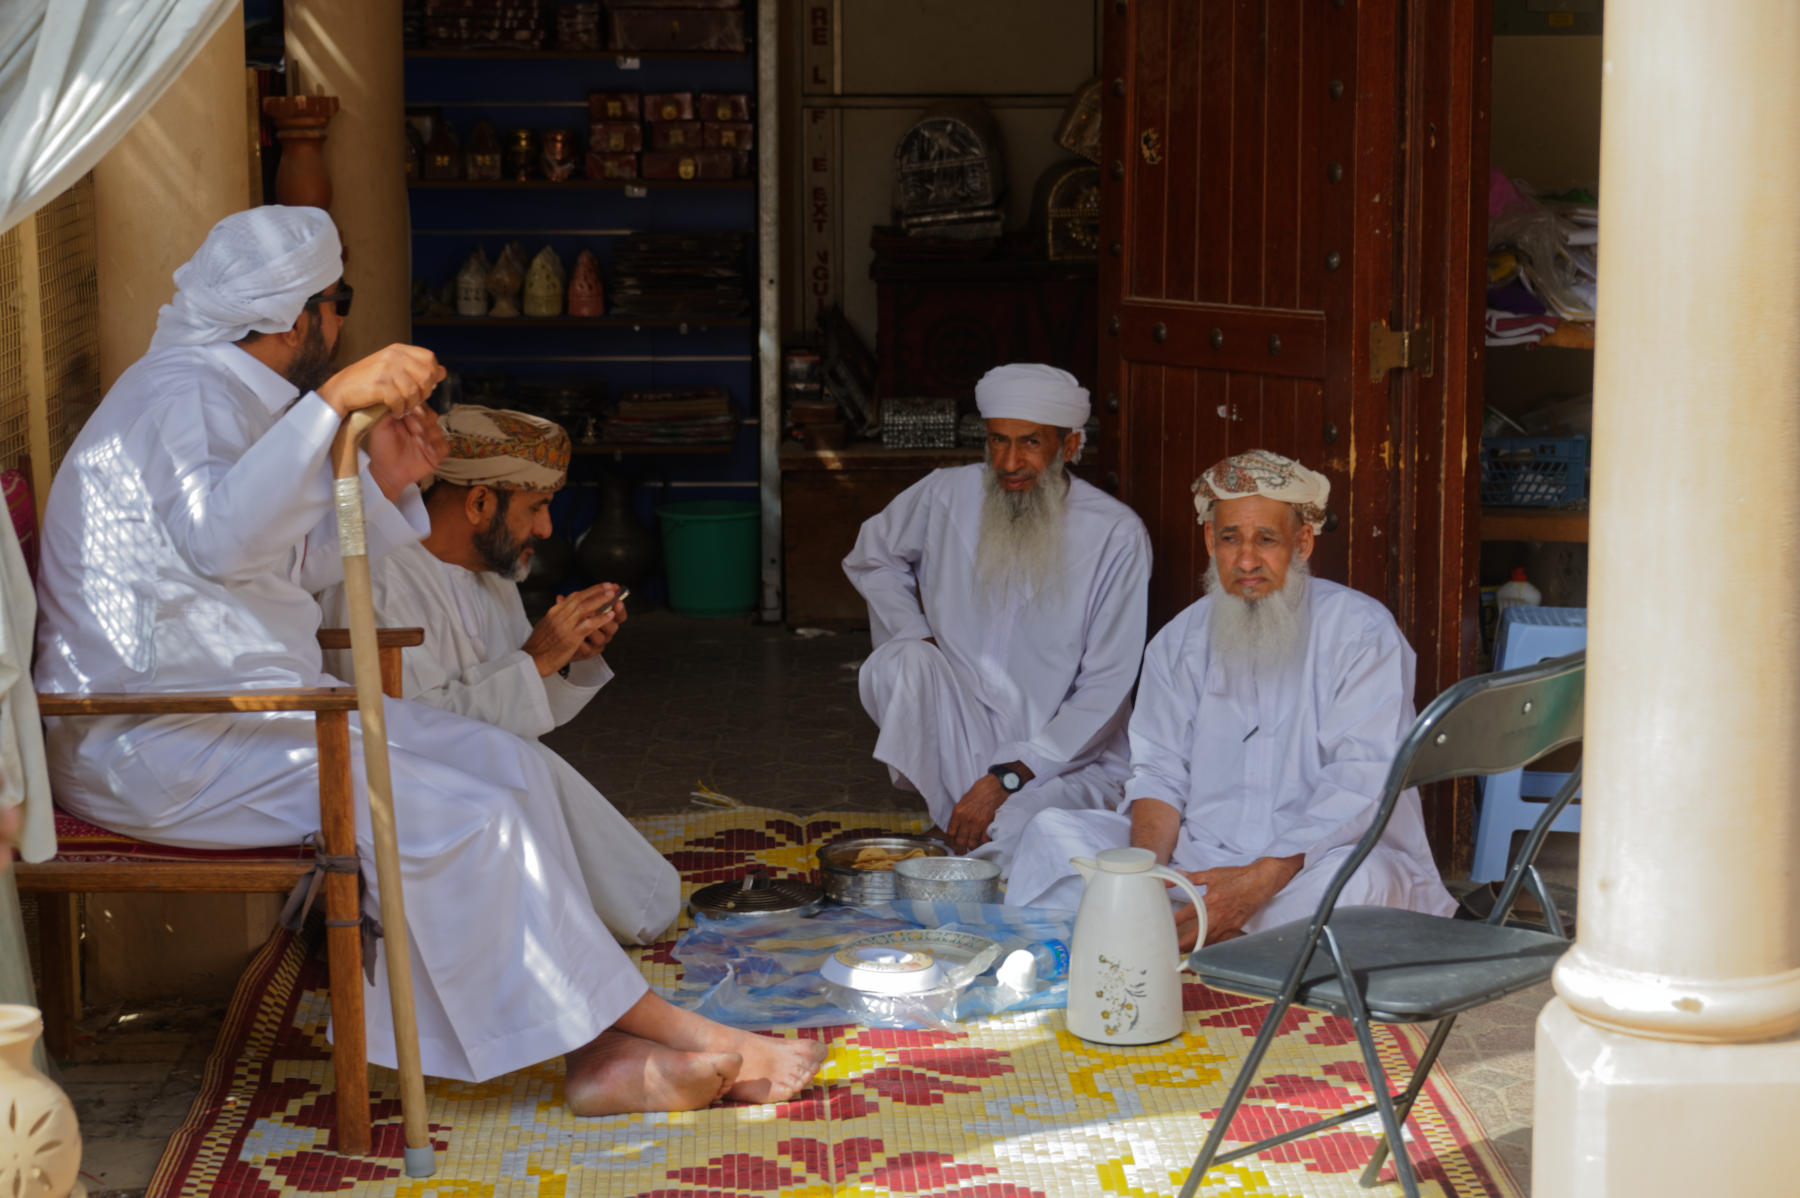 Nizwa Souq scene, Oman